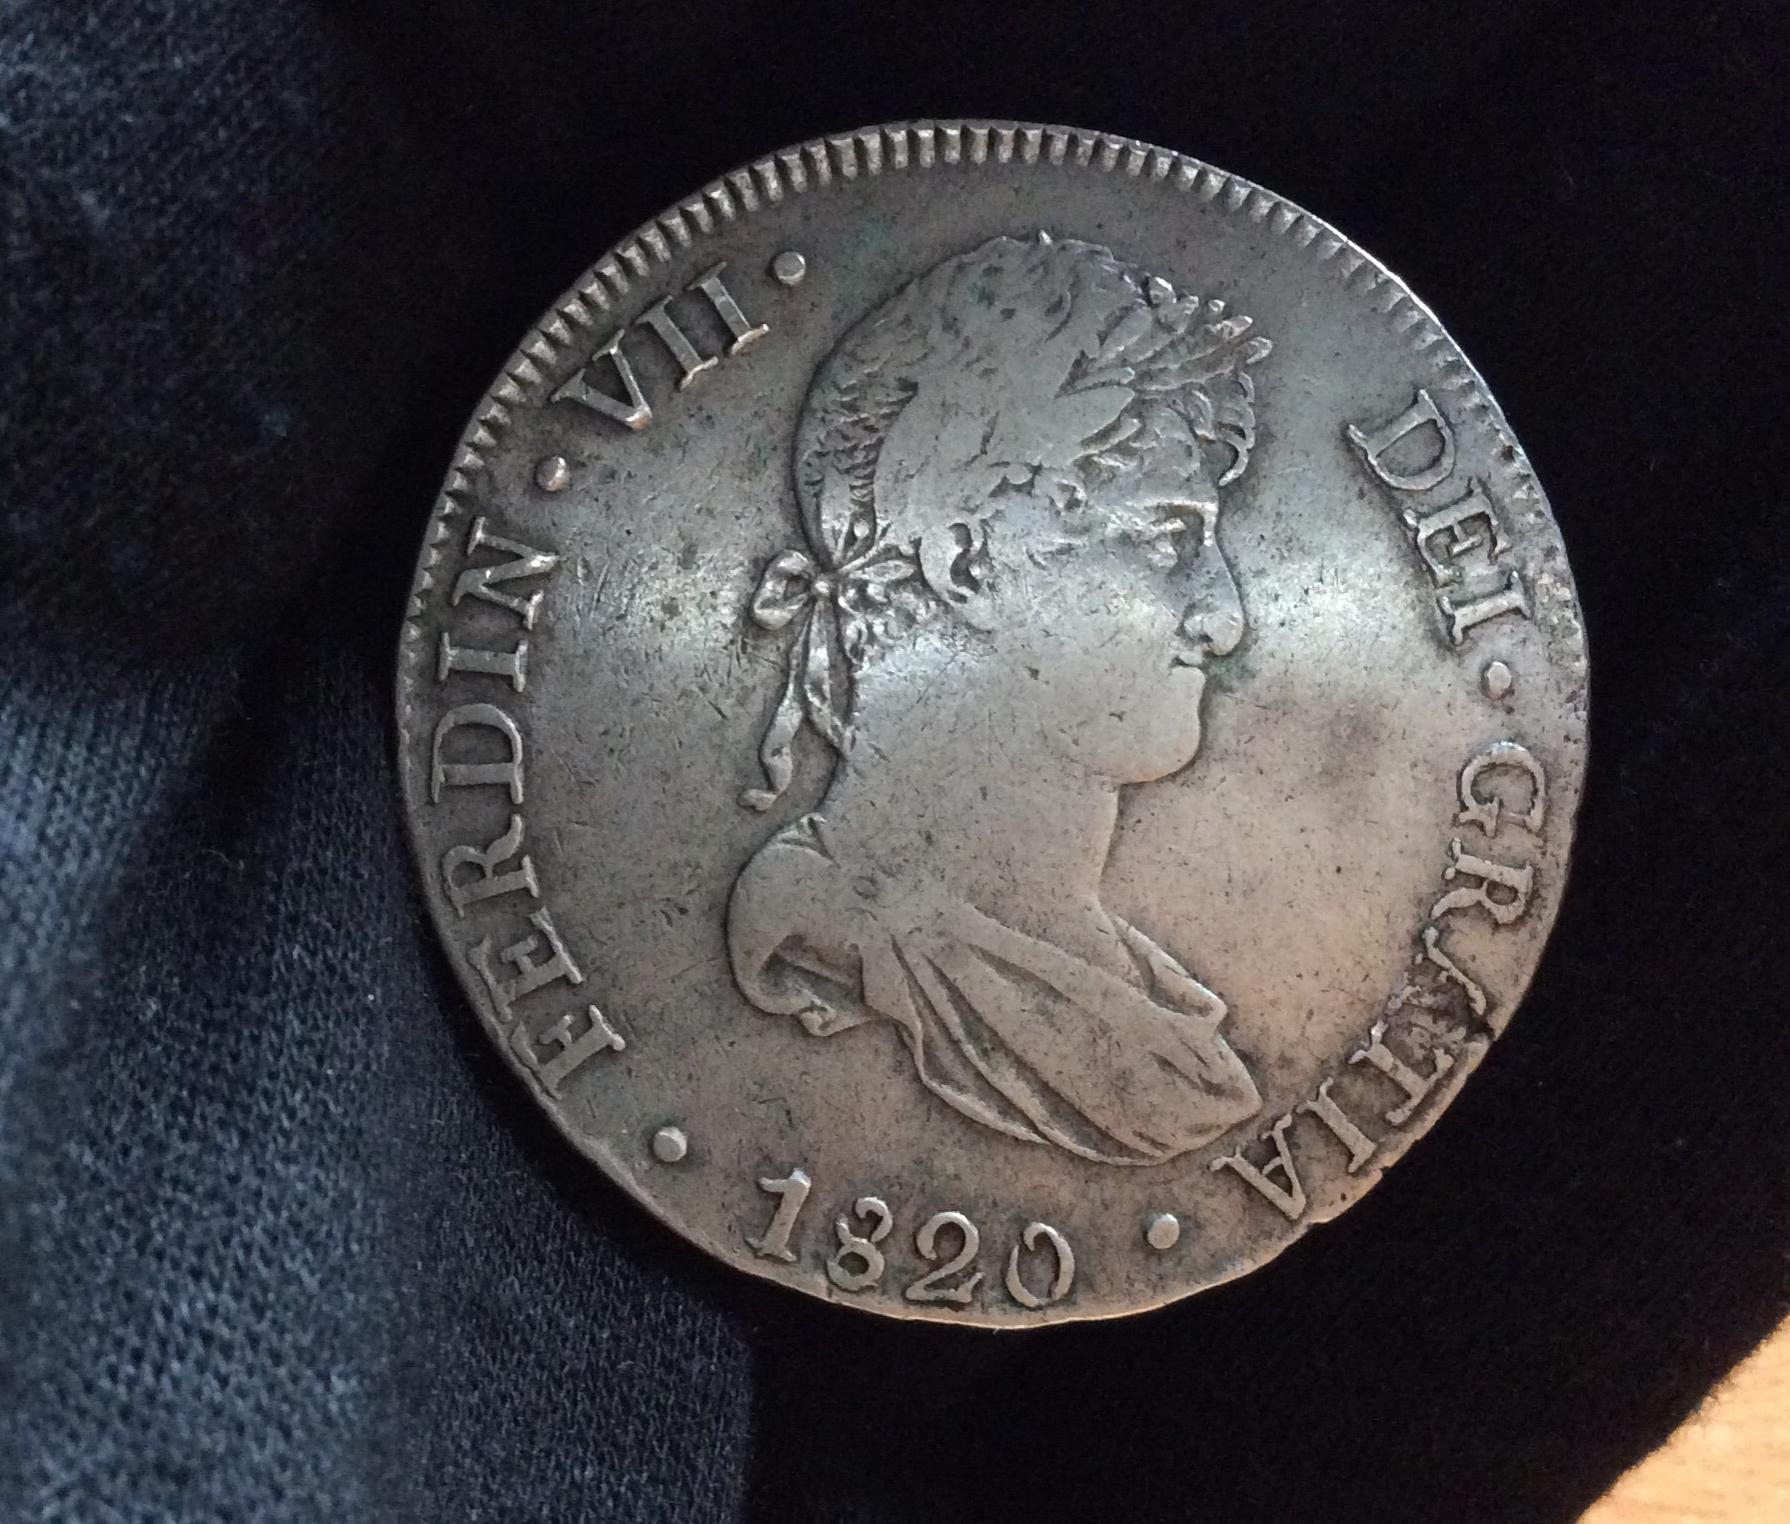 8 REALES 1820 - LIMA - FERNANDO VII